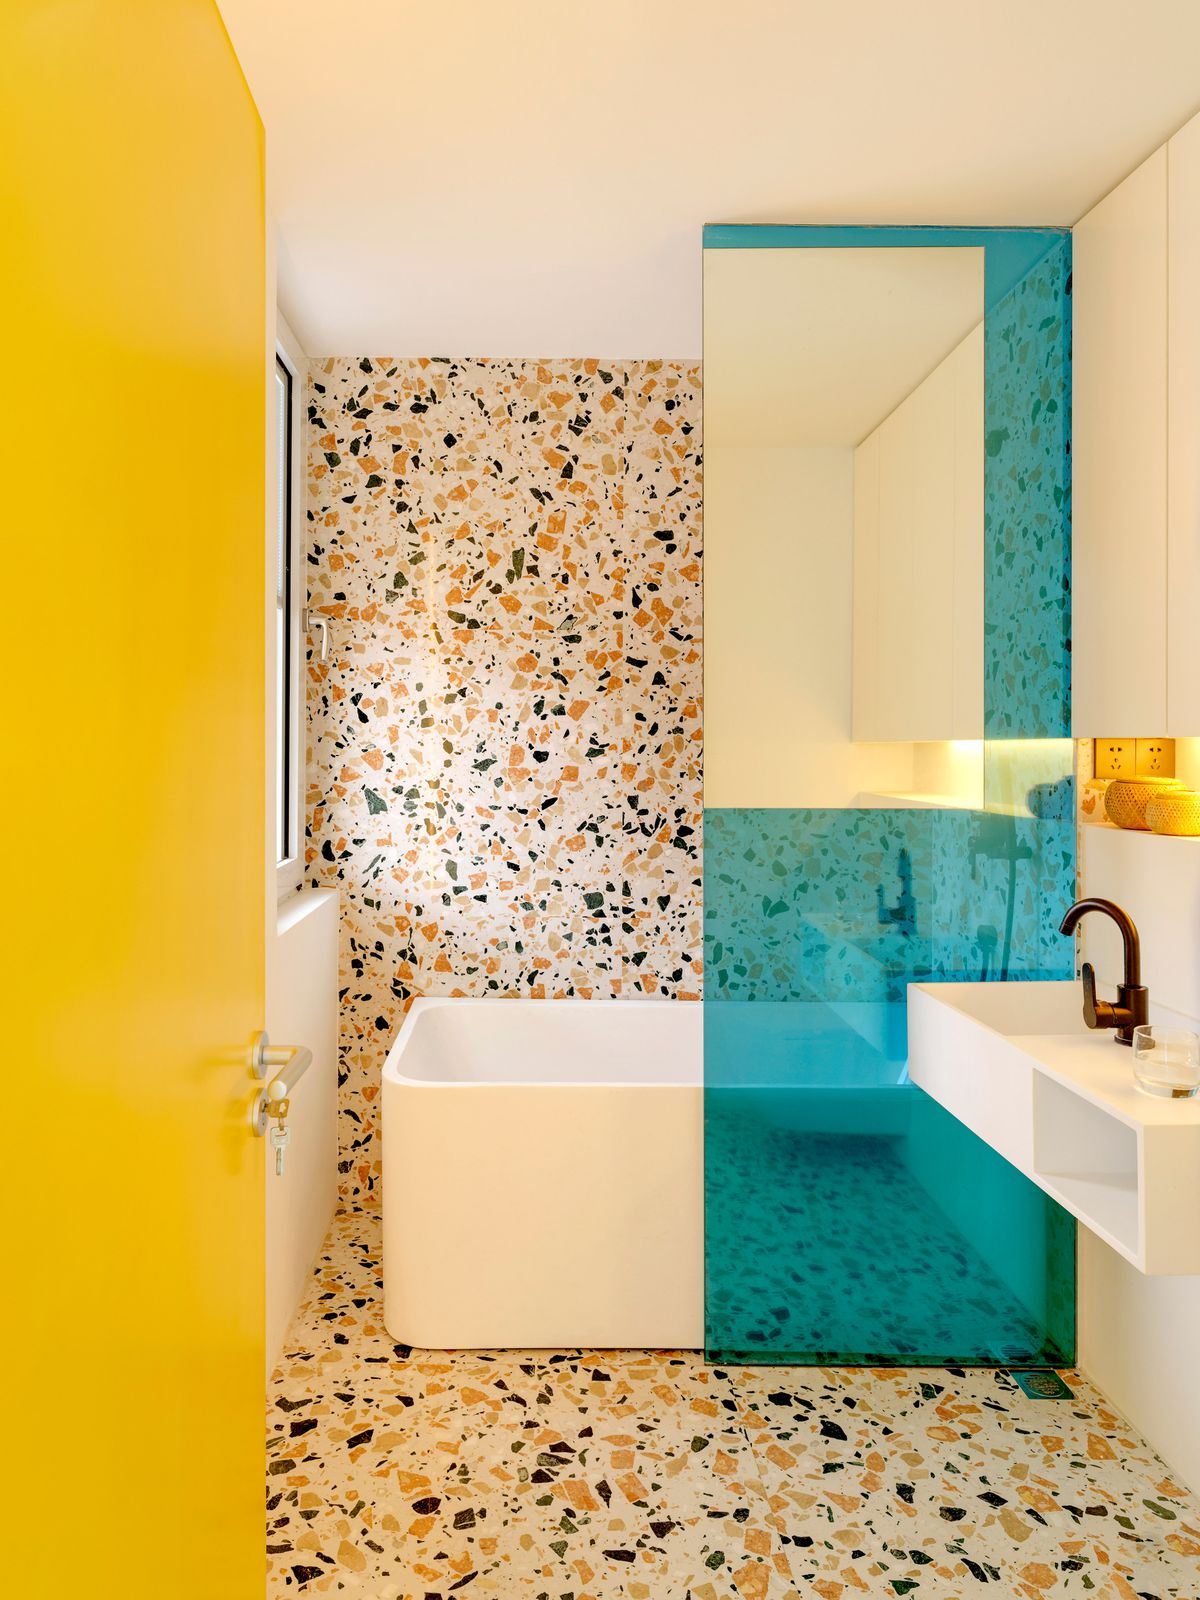 Bathroom with terrazzo floors and walls, yellow door, and blue glass.